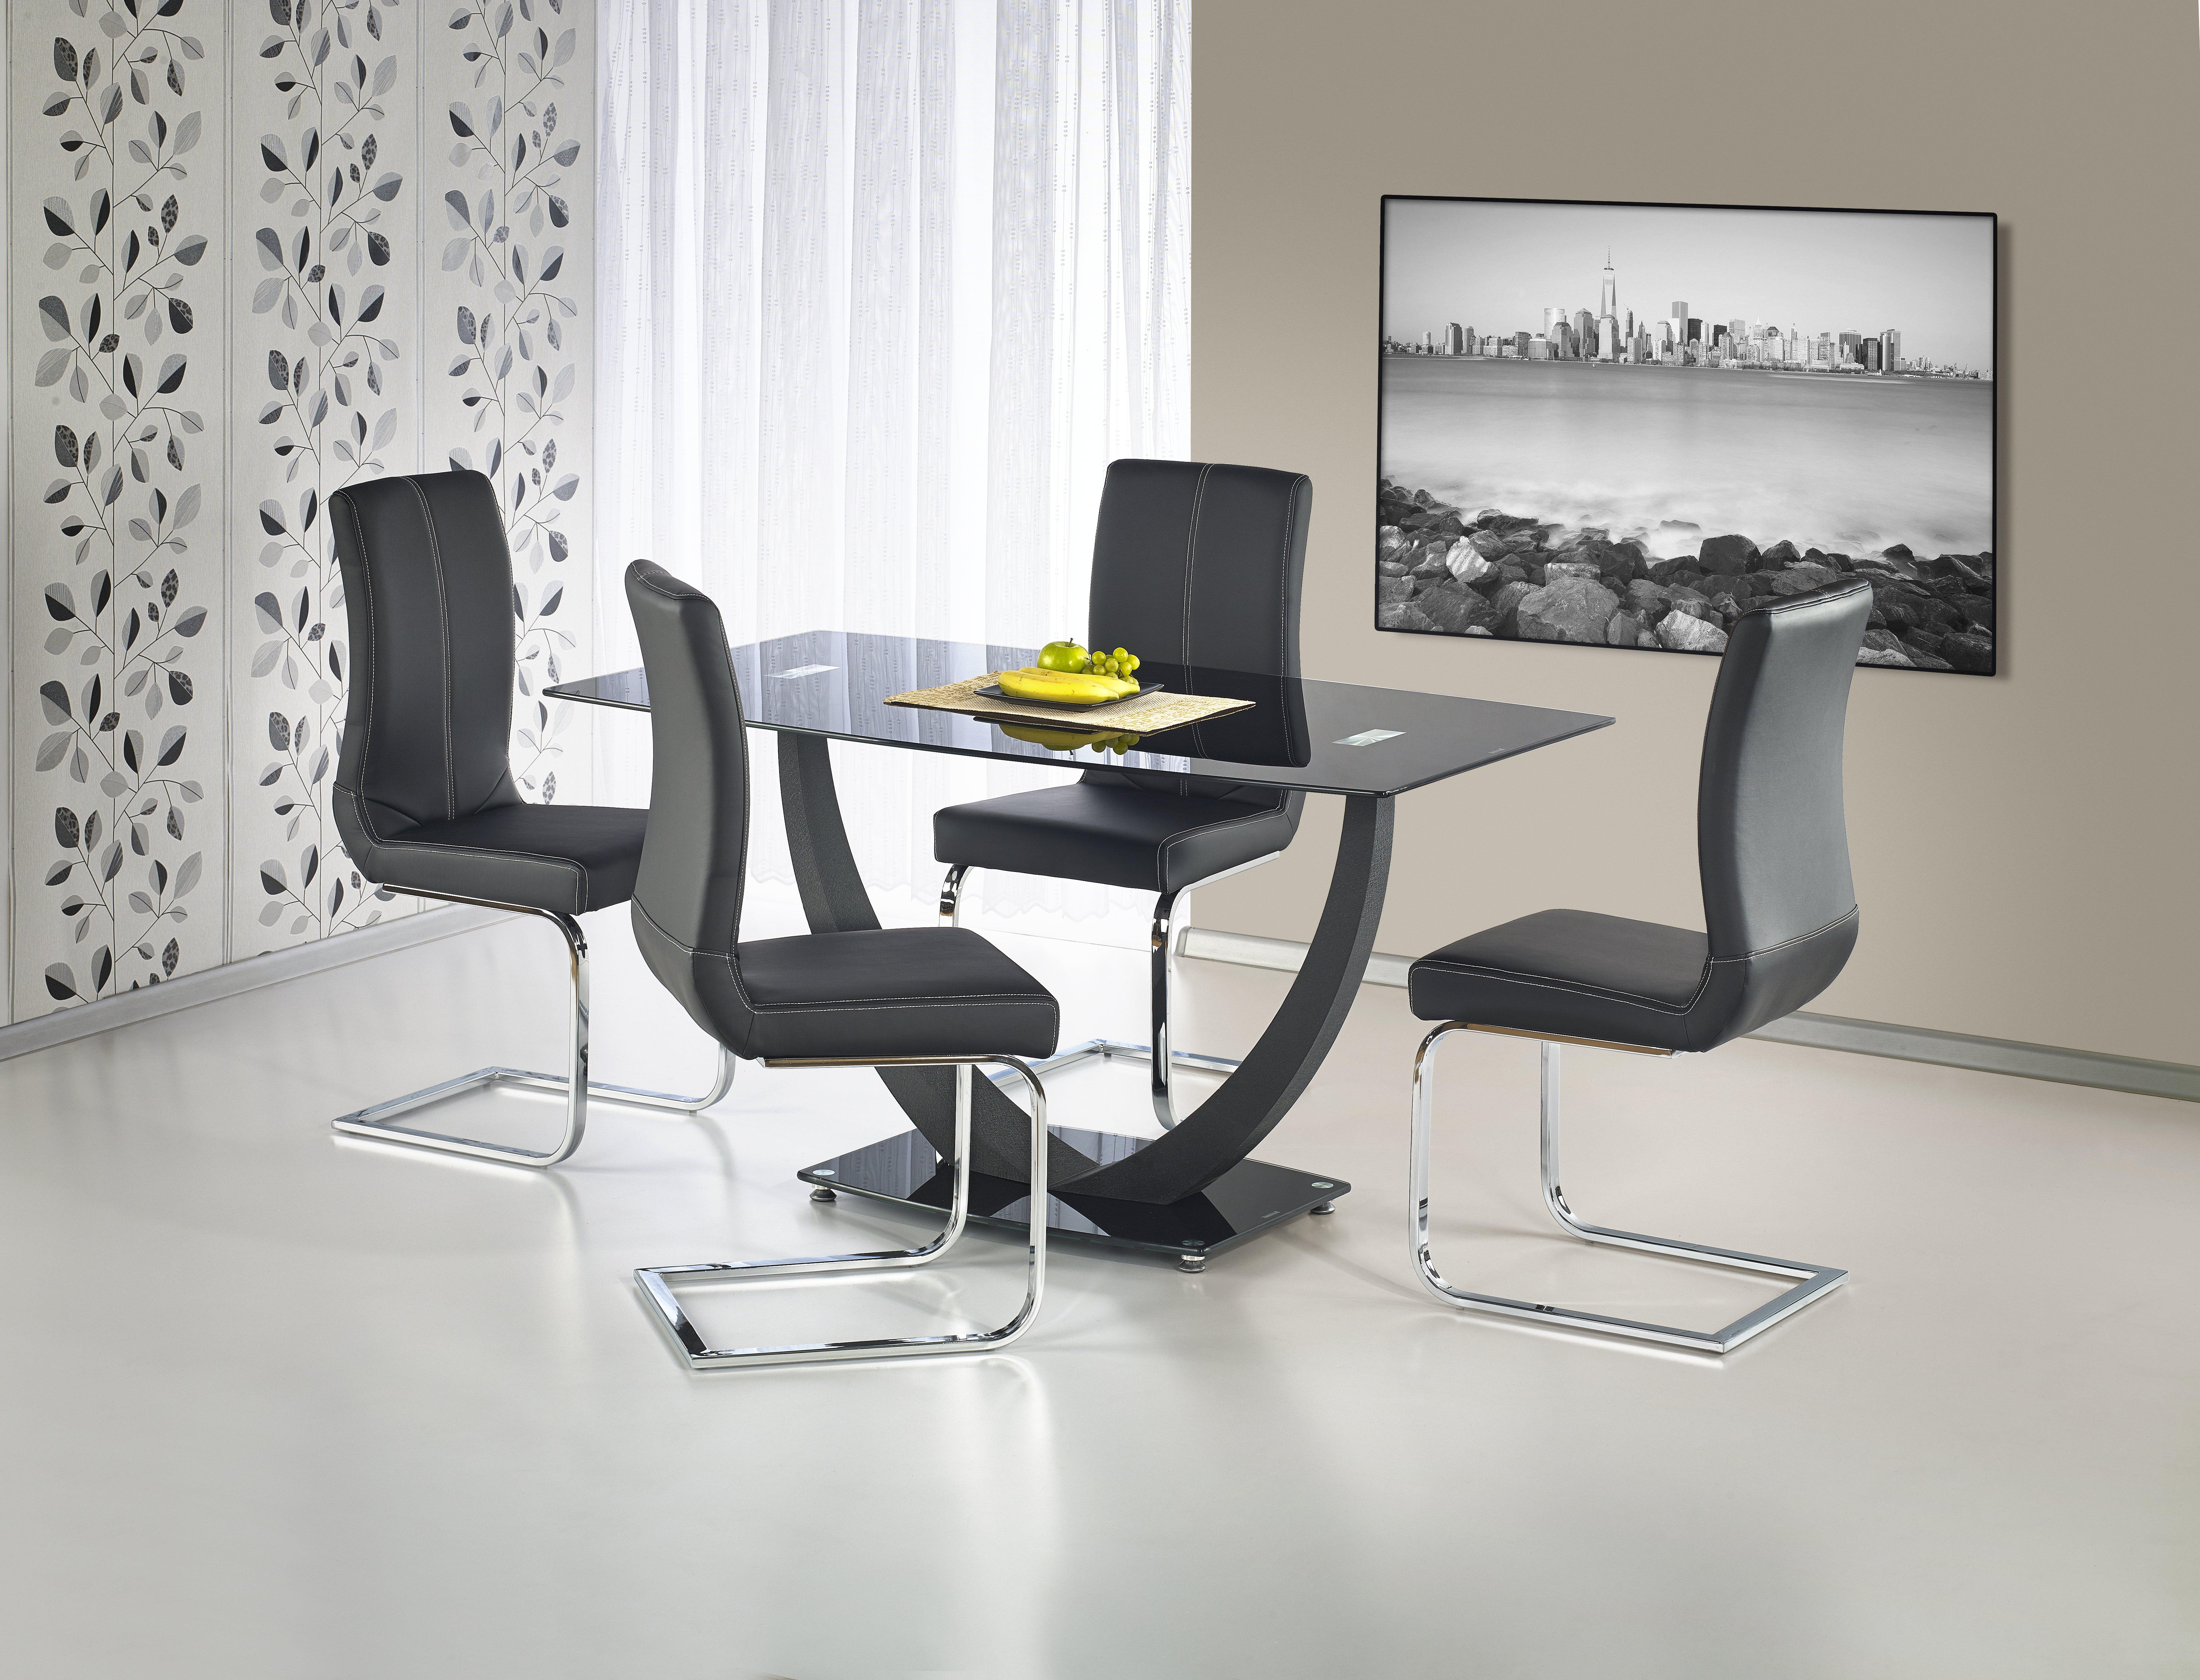 Jídelní stůl - Halmar - Anton (pro 6 osob)